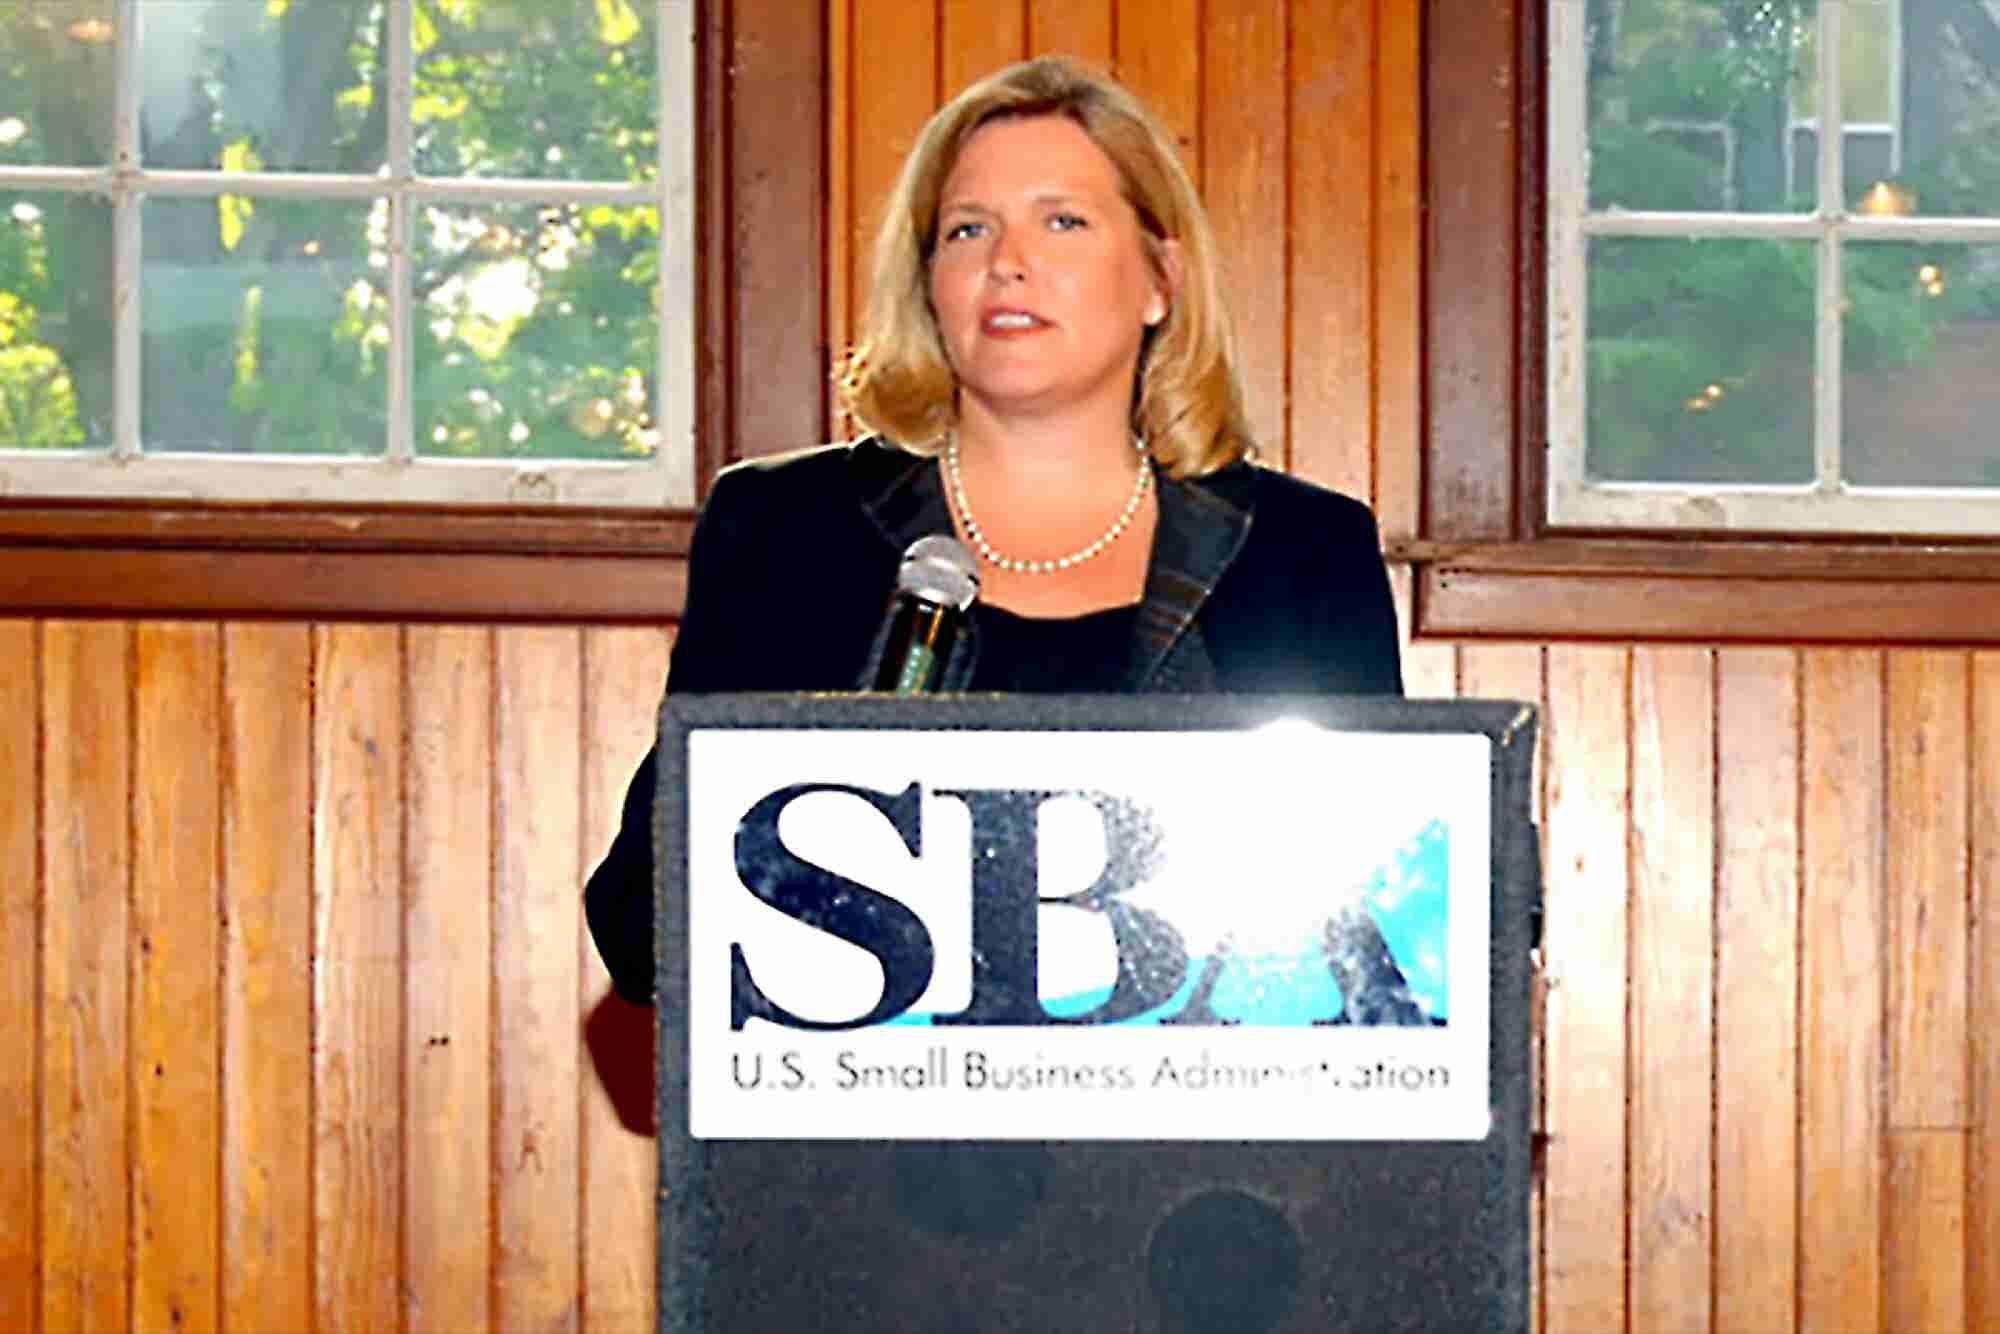 SBA Gets a Temporary Chief